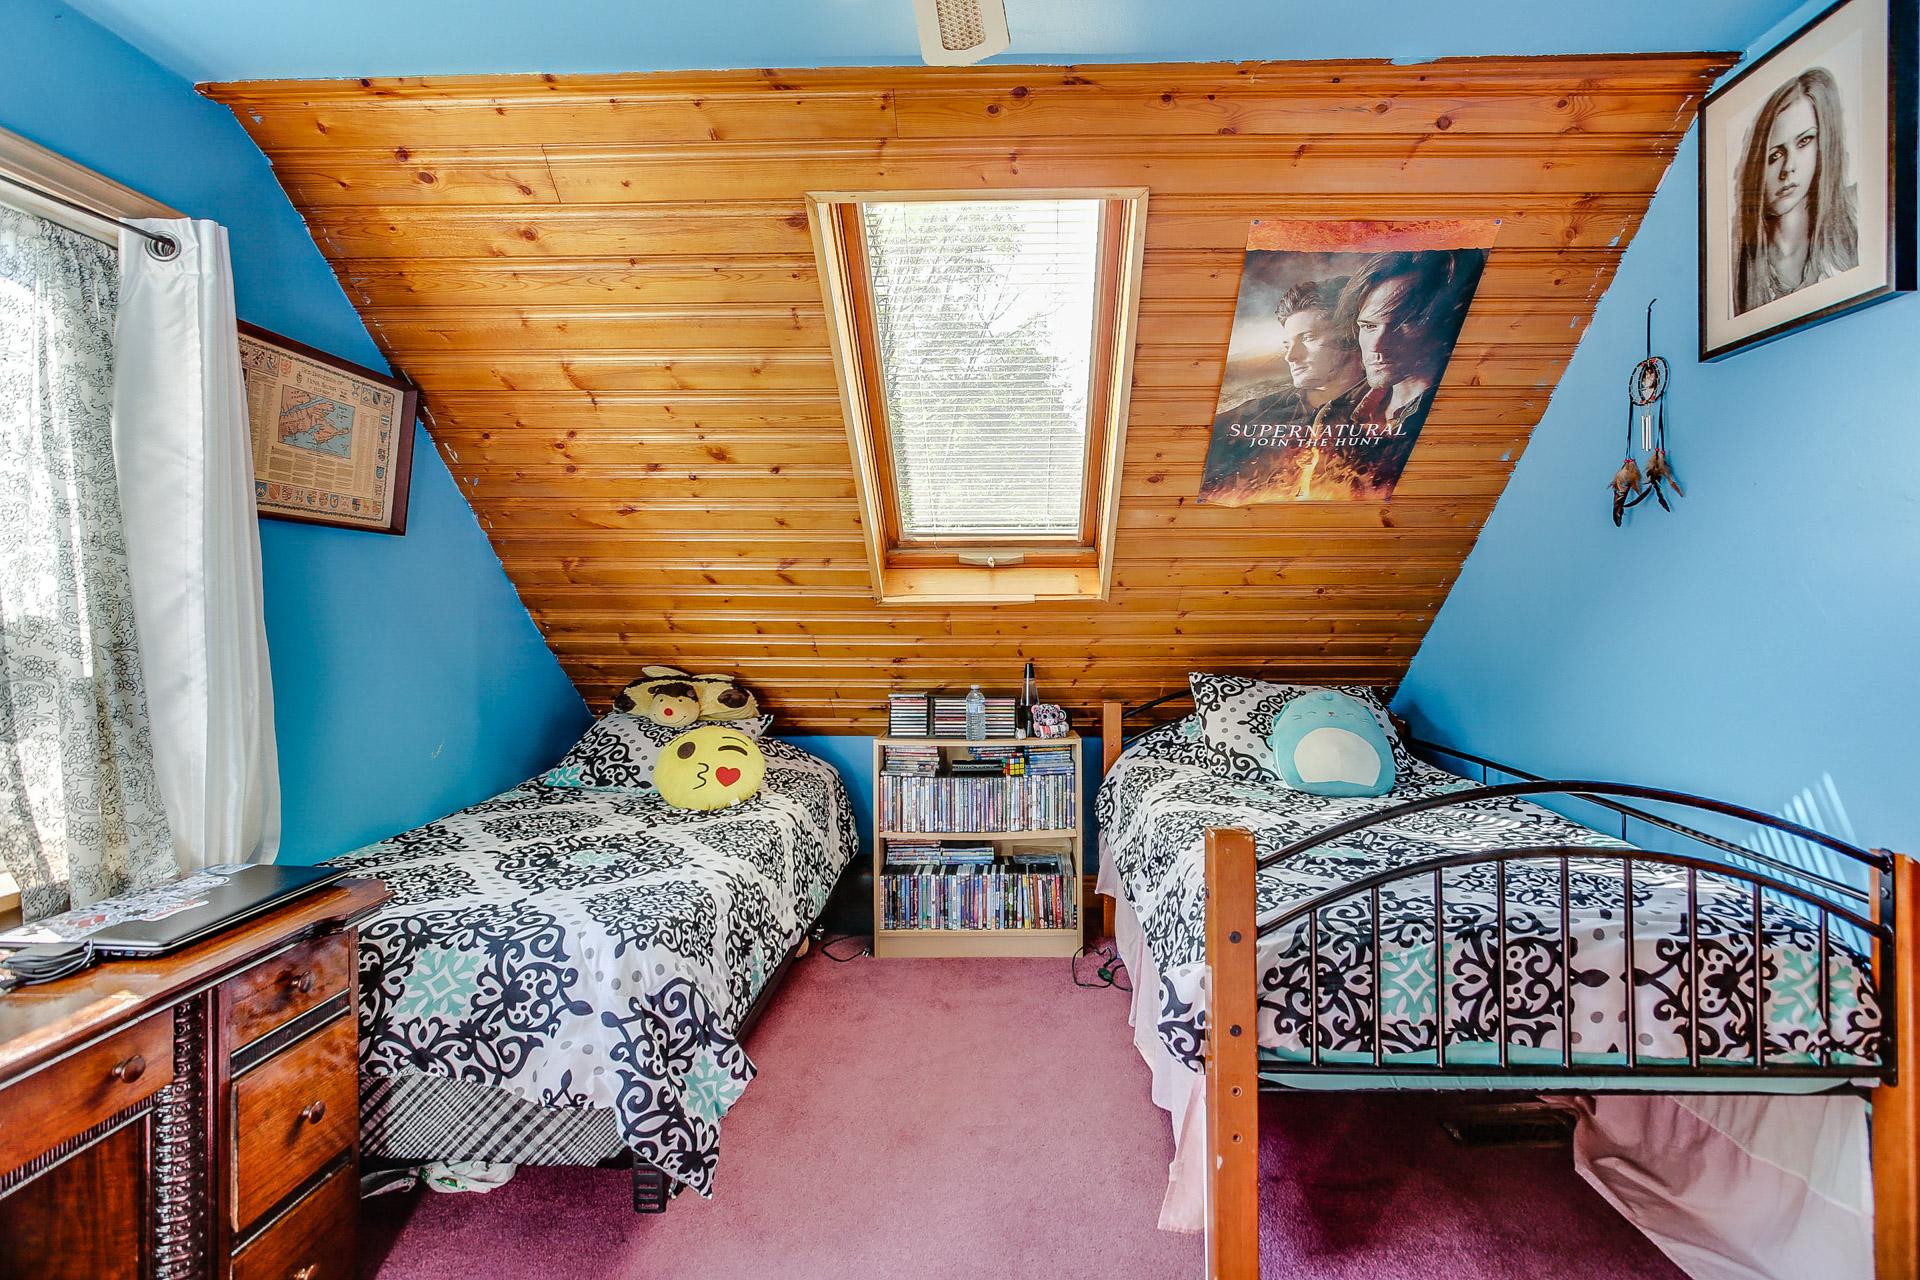 21_second_bedroom1.jpg